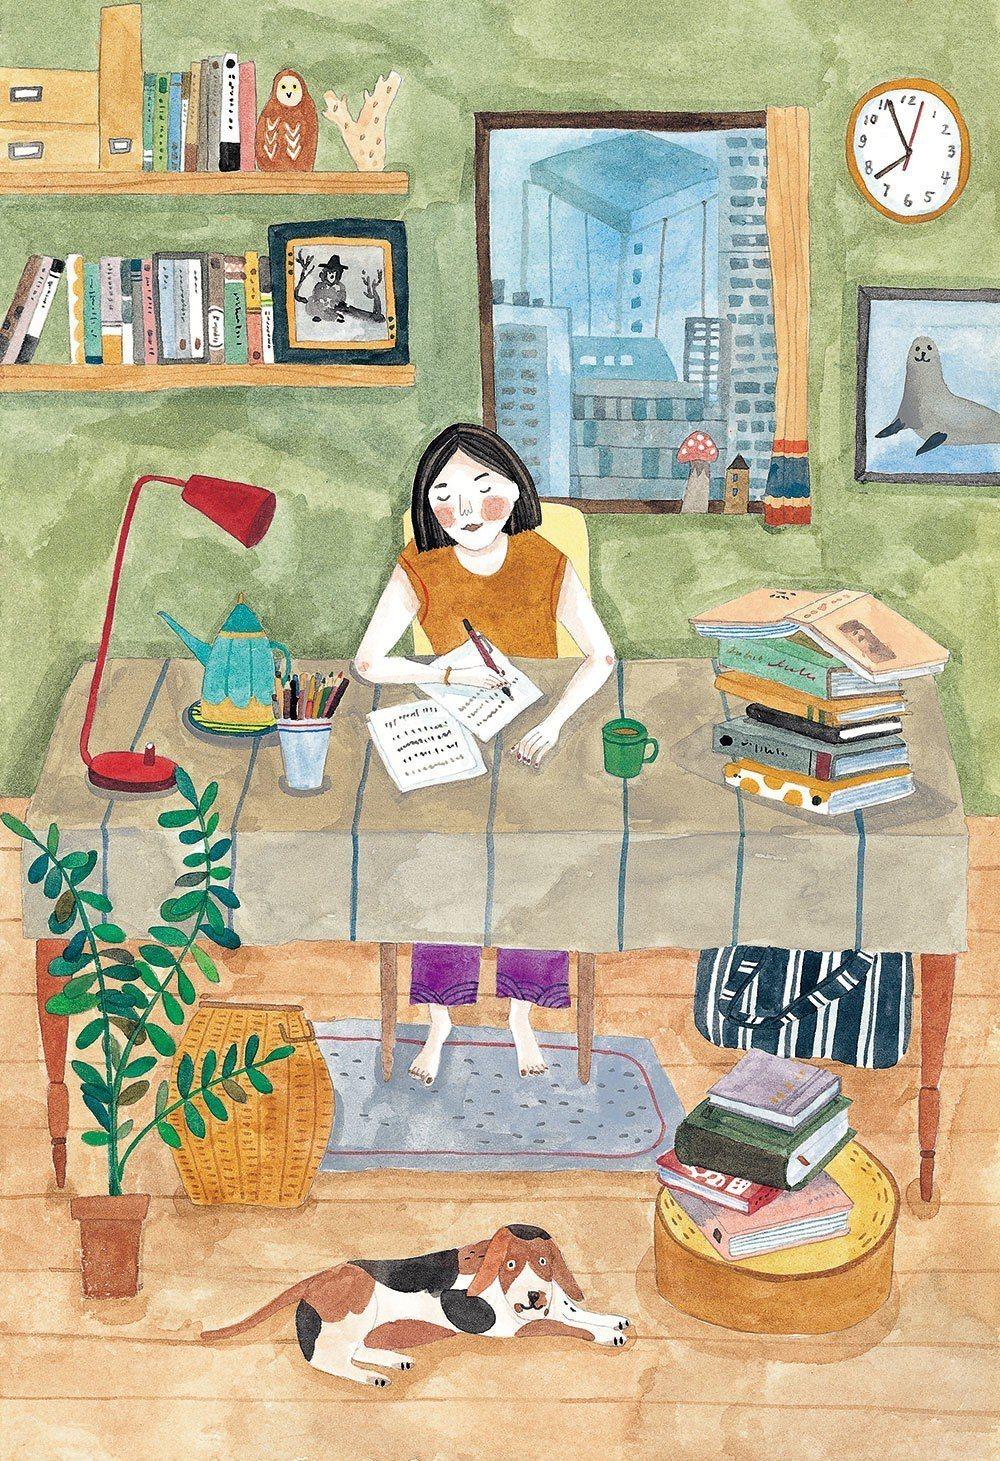 Soupy筆下的芭娜娜。由於日本有很多跟蹤狂,為了保護隱私,芭娜娜曾表示希望插畫...